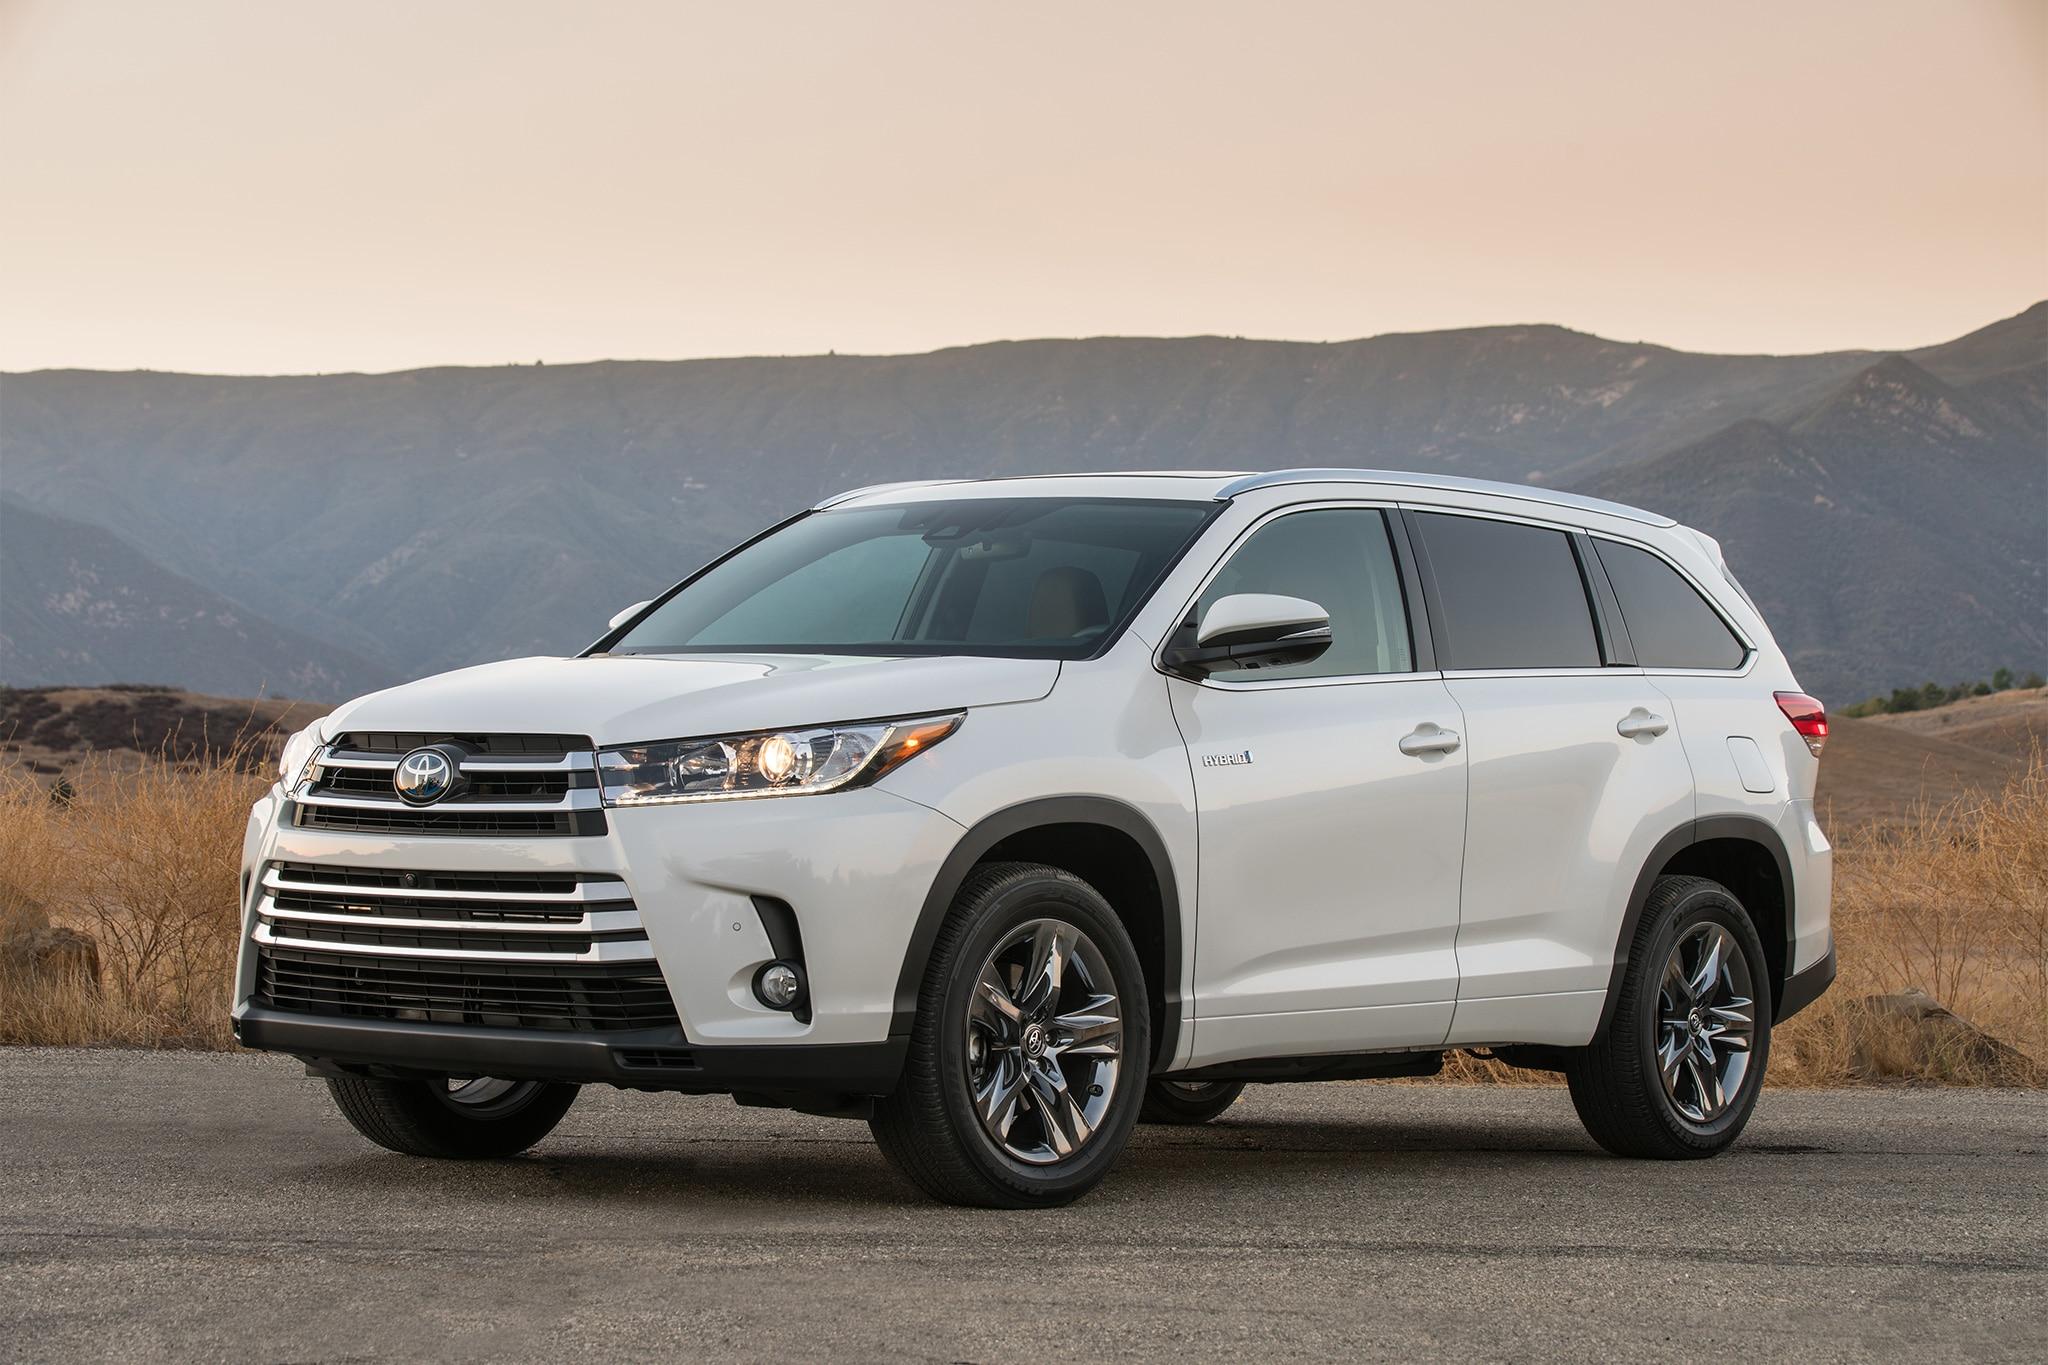 2017 Toyota Highlander Hybrid Limited front three quarter 06